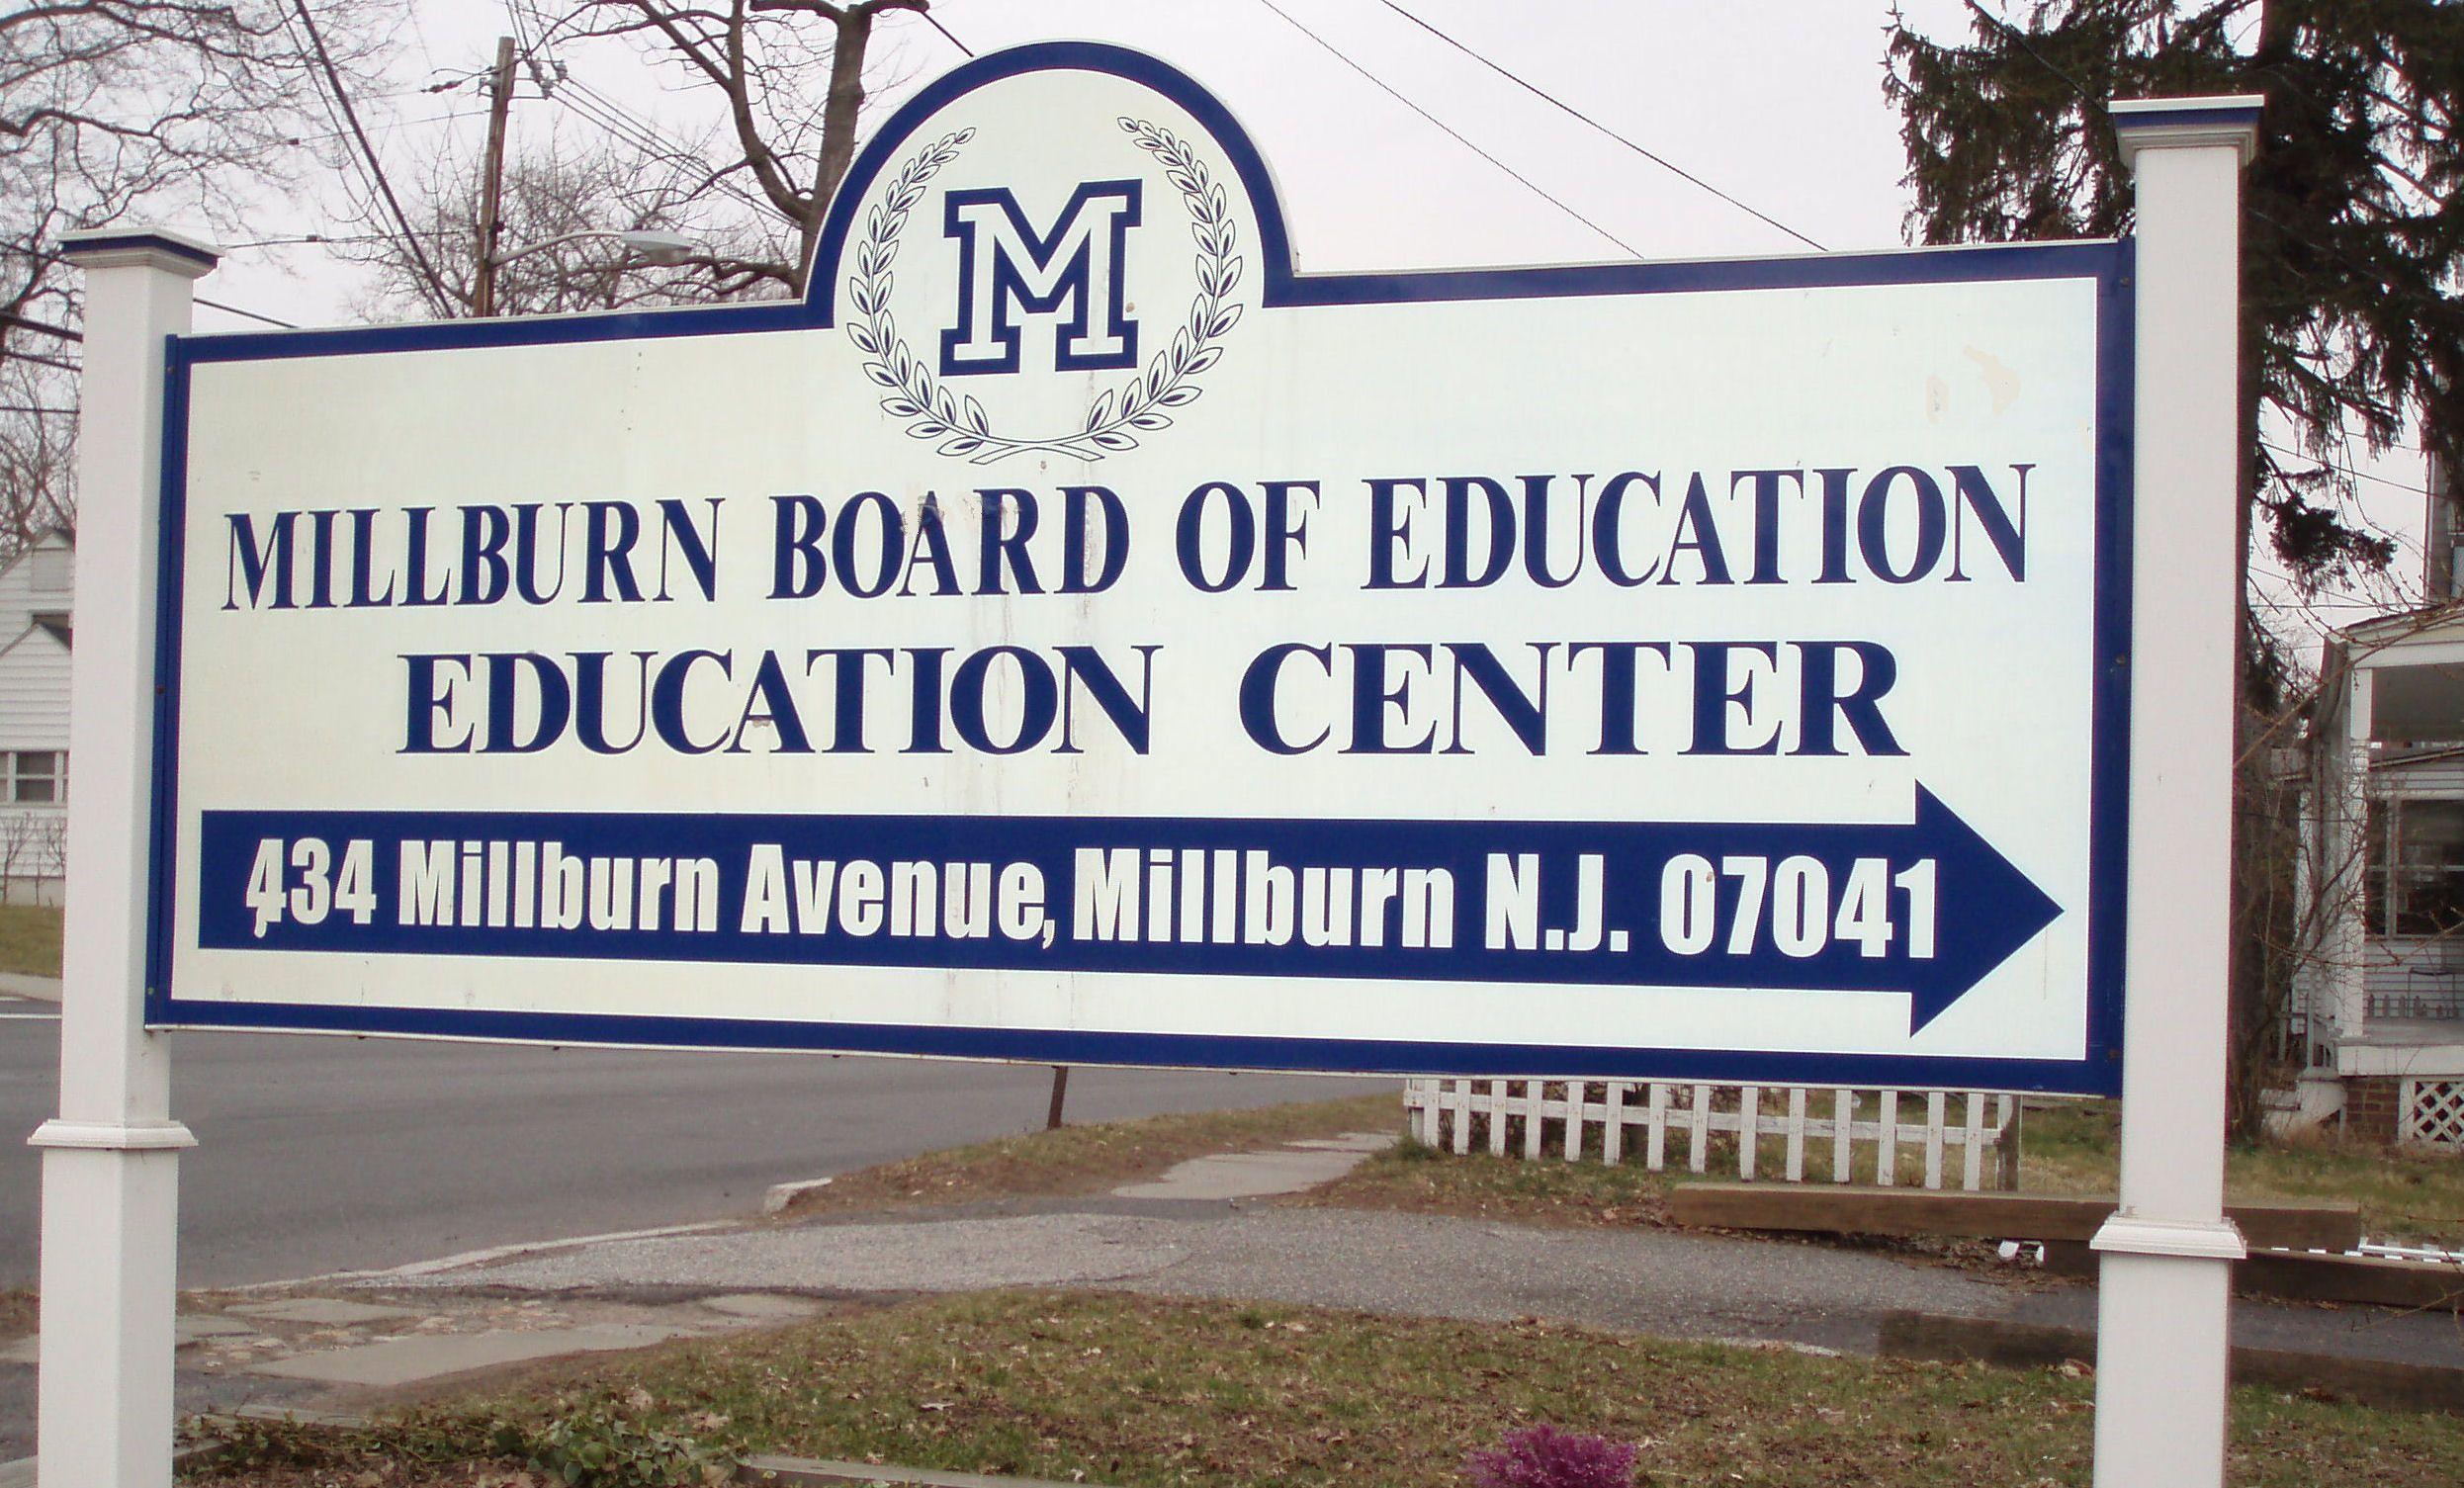 One of the best school systems in NJ - Millburn Public Schools